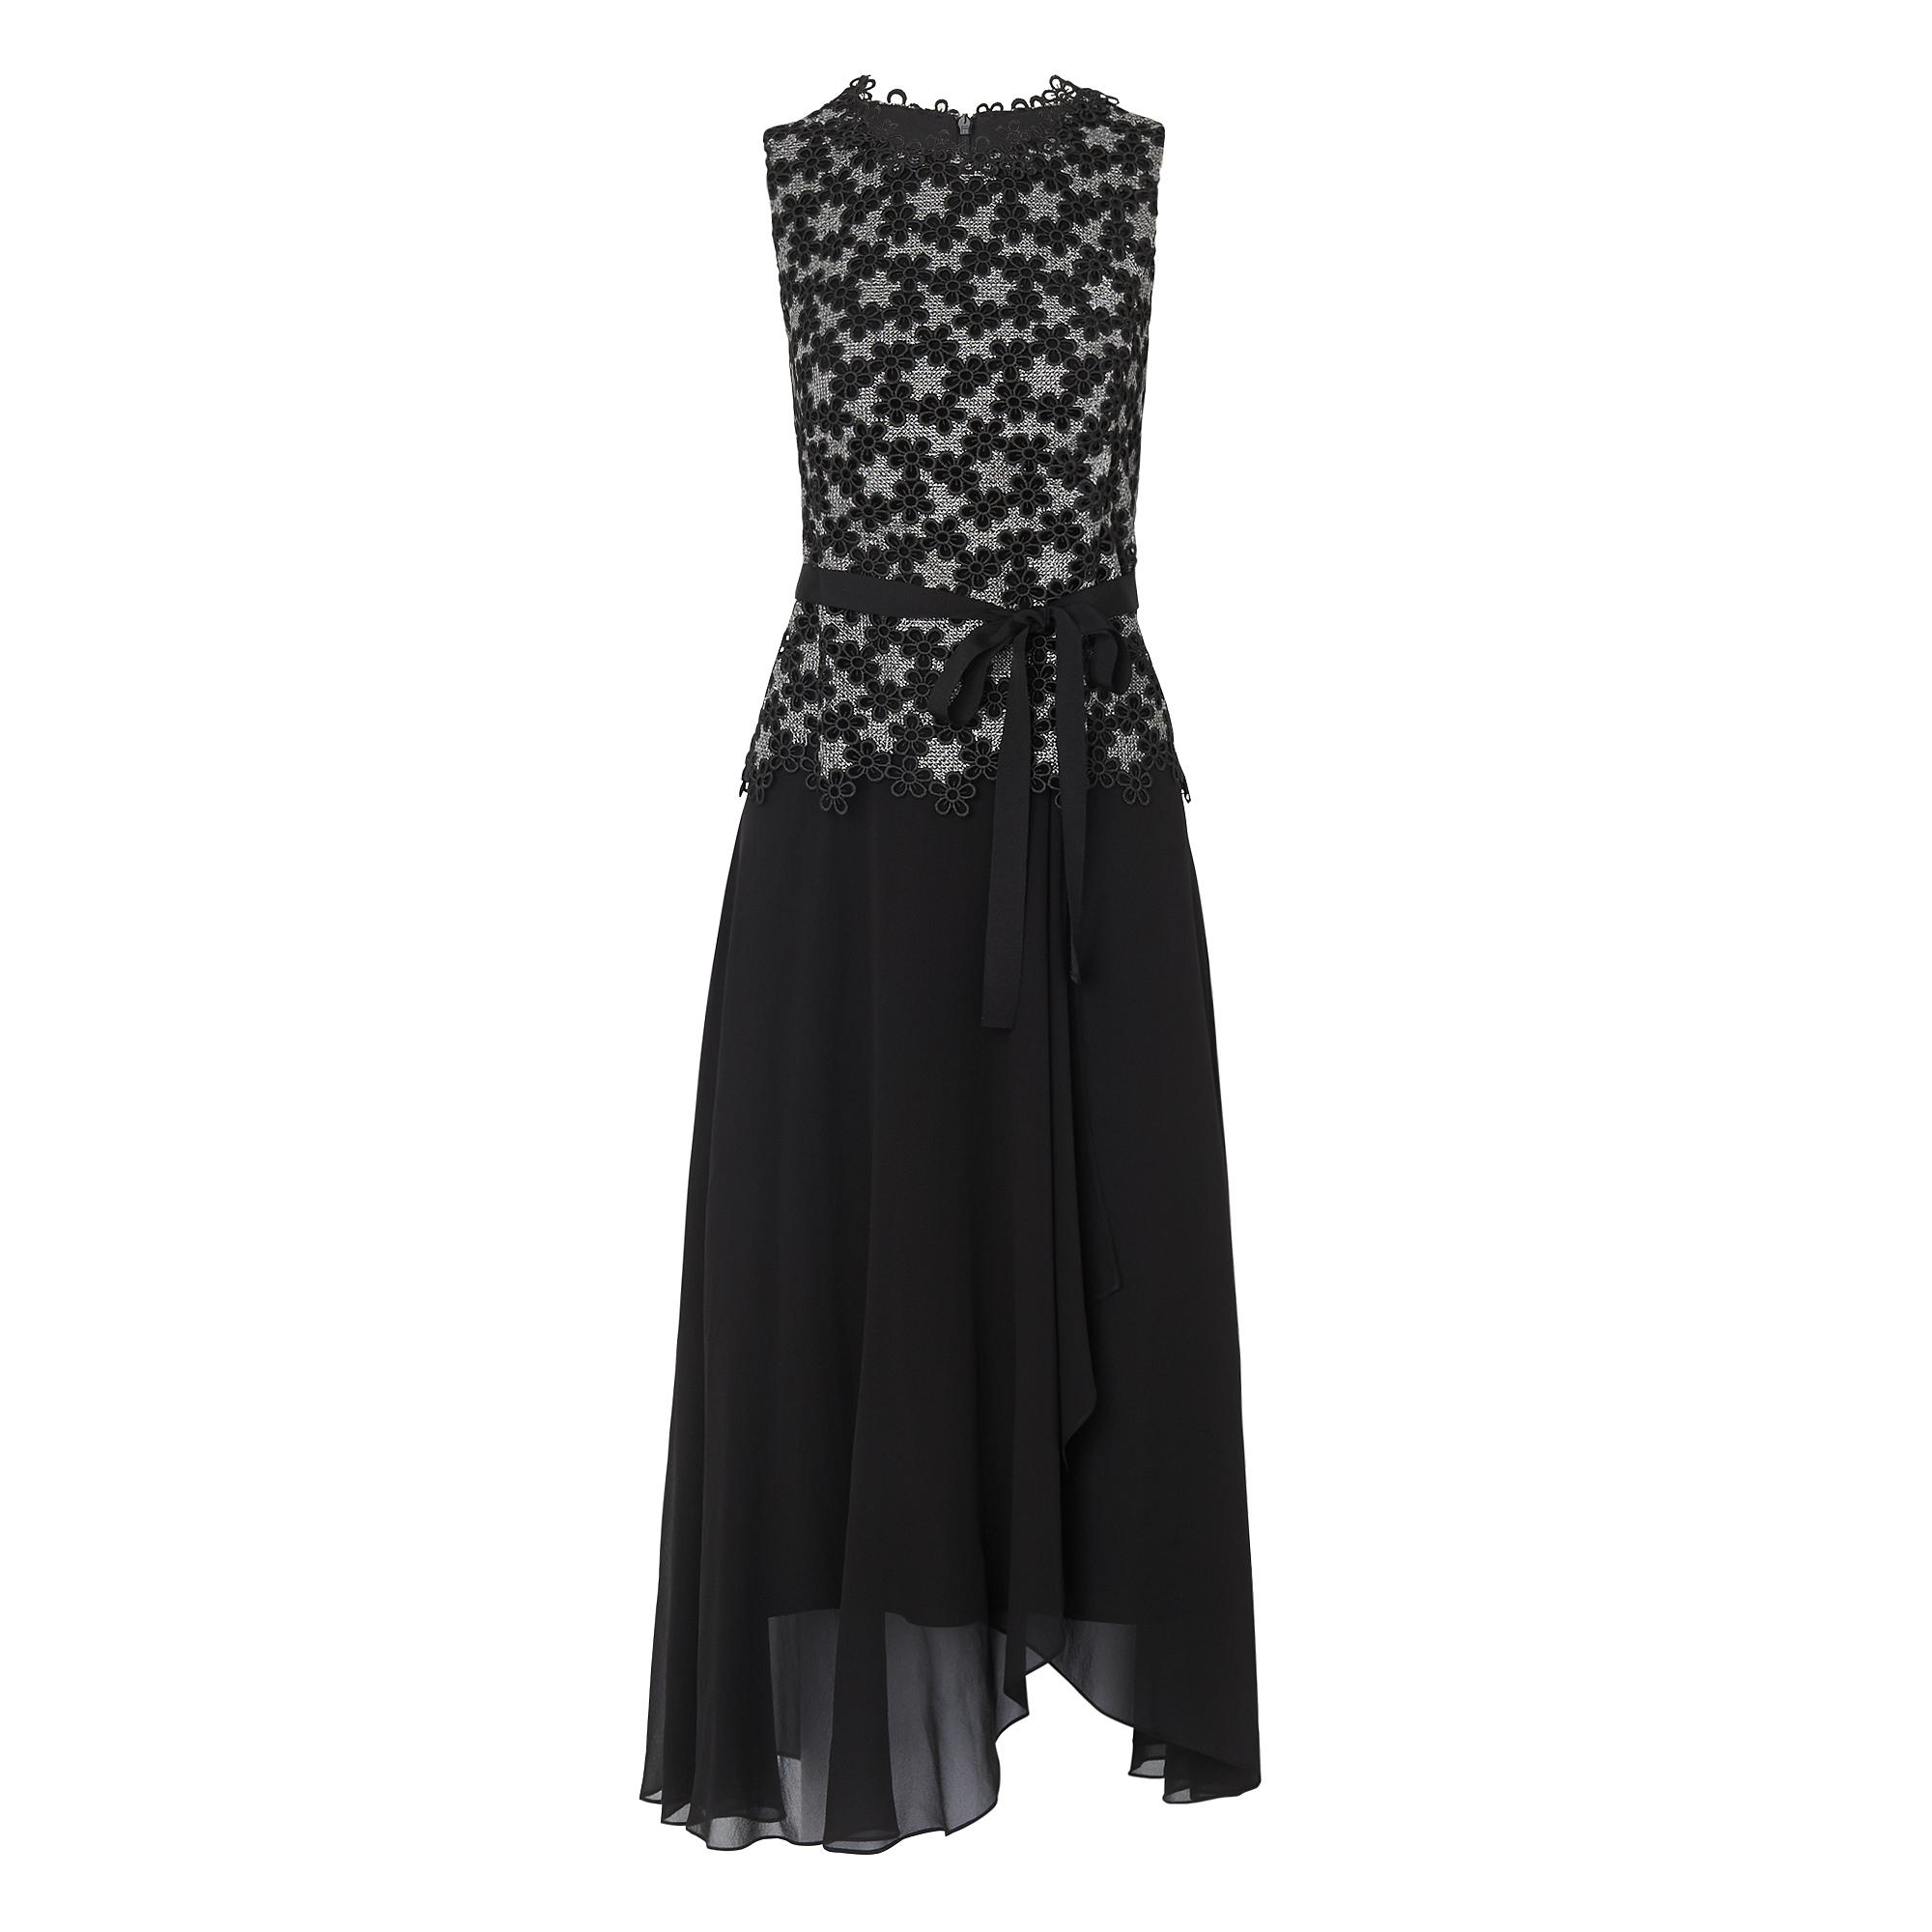 Johanna Black Floral Dress